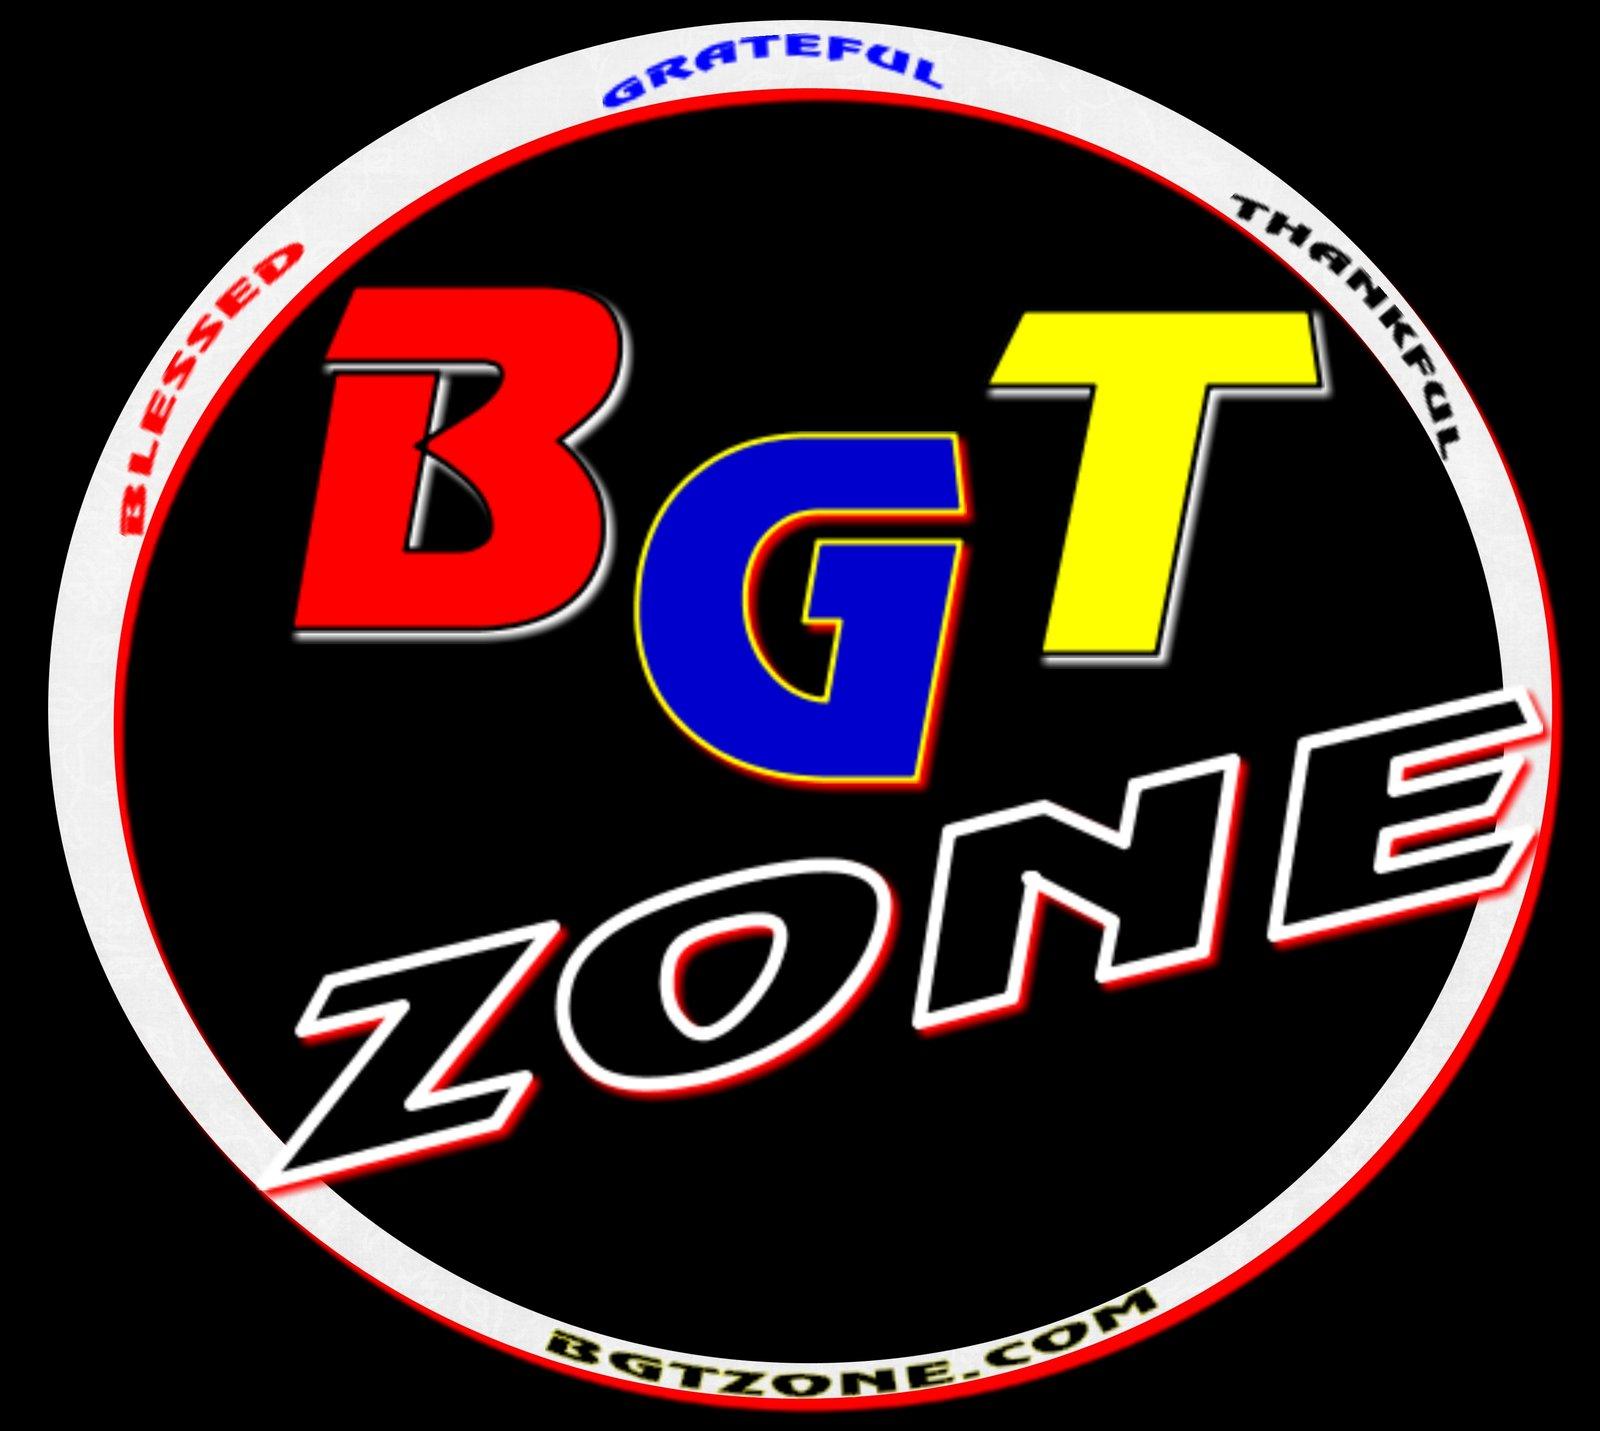 BGT Zone's account image